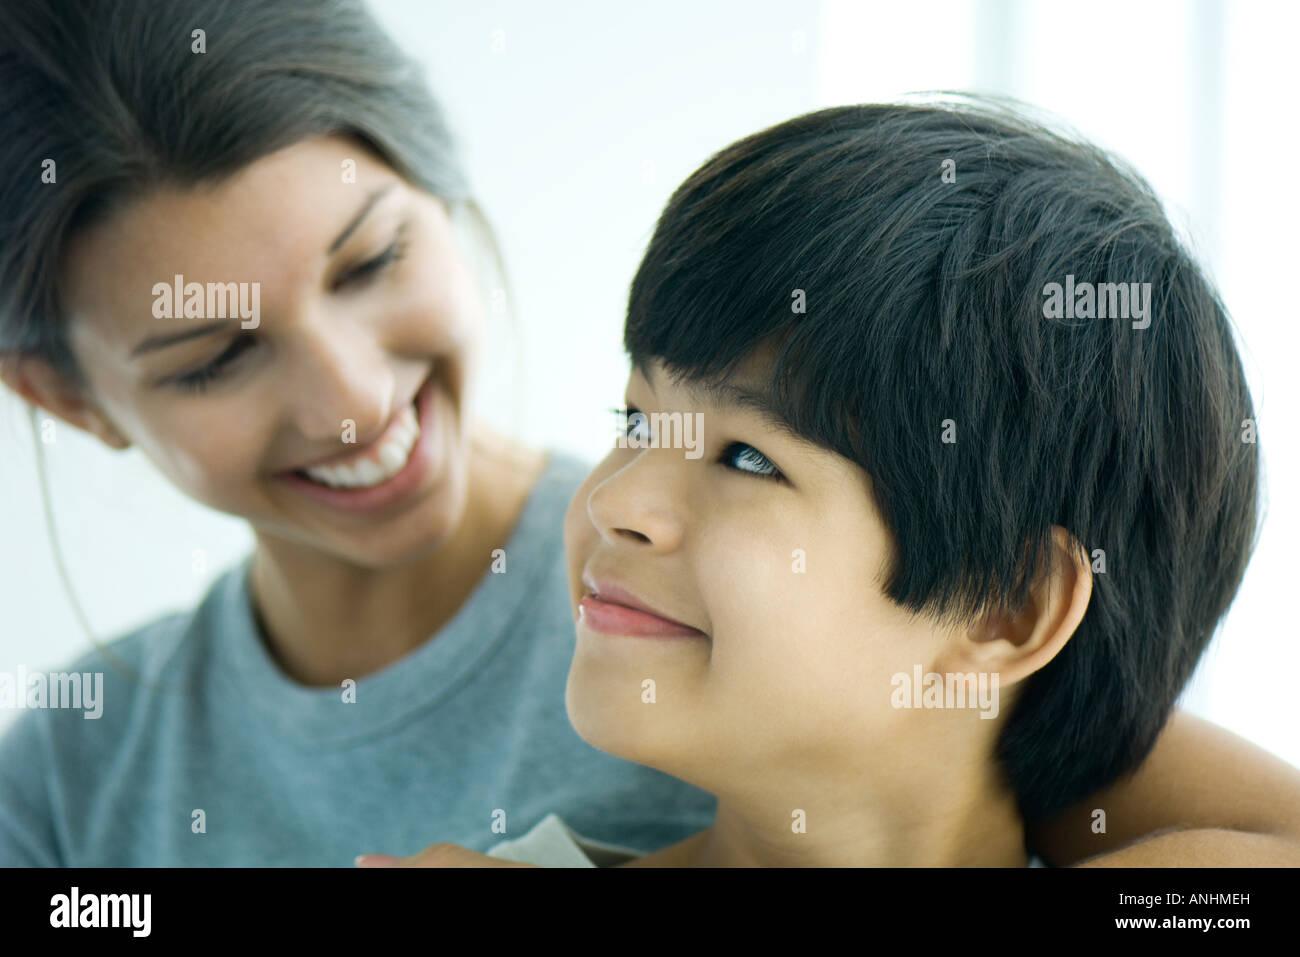 Boy looking over shoulder at sister, both smiling - Stock Image